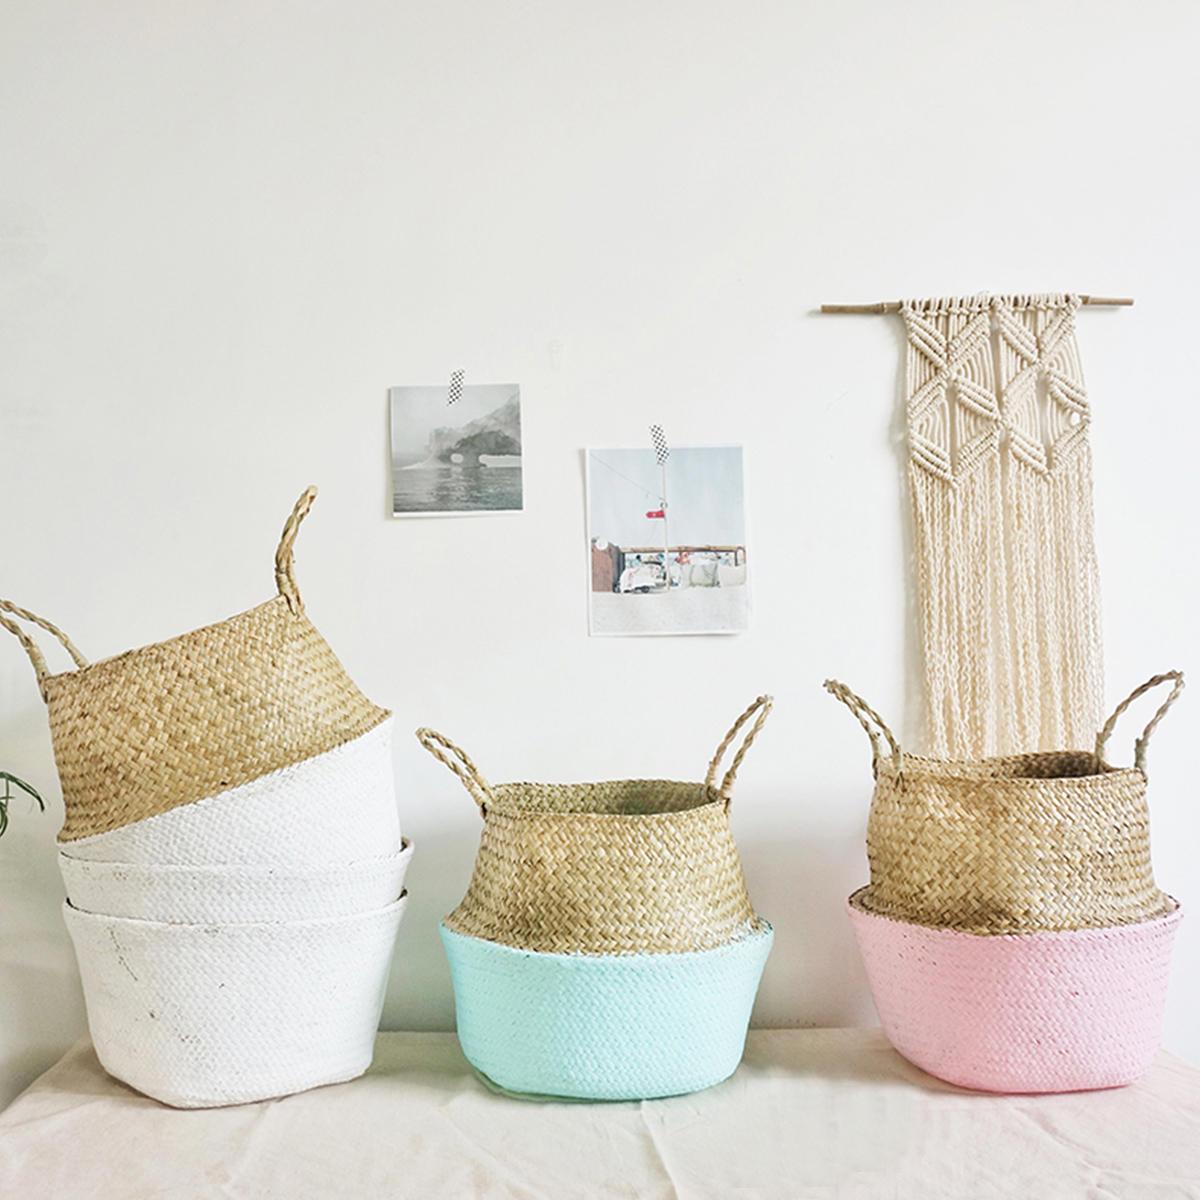 Geometric Metal Flower Pot Stand Chic Indoor Garden Plant Holder Display Planter - 3